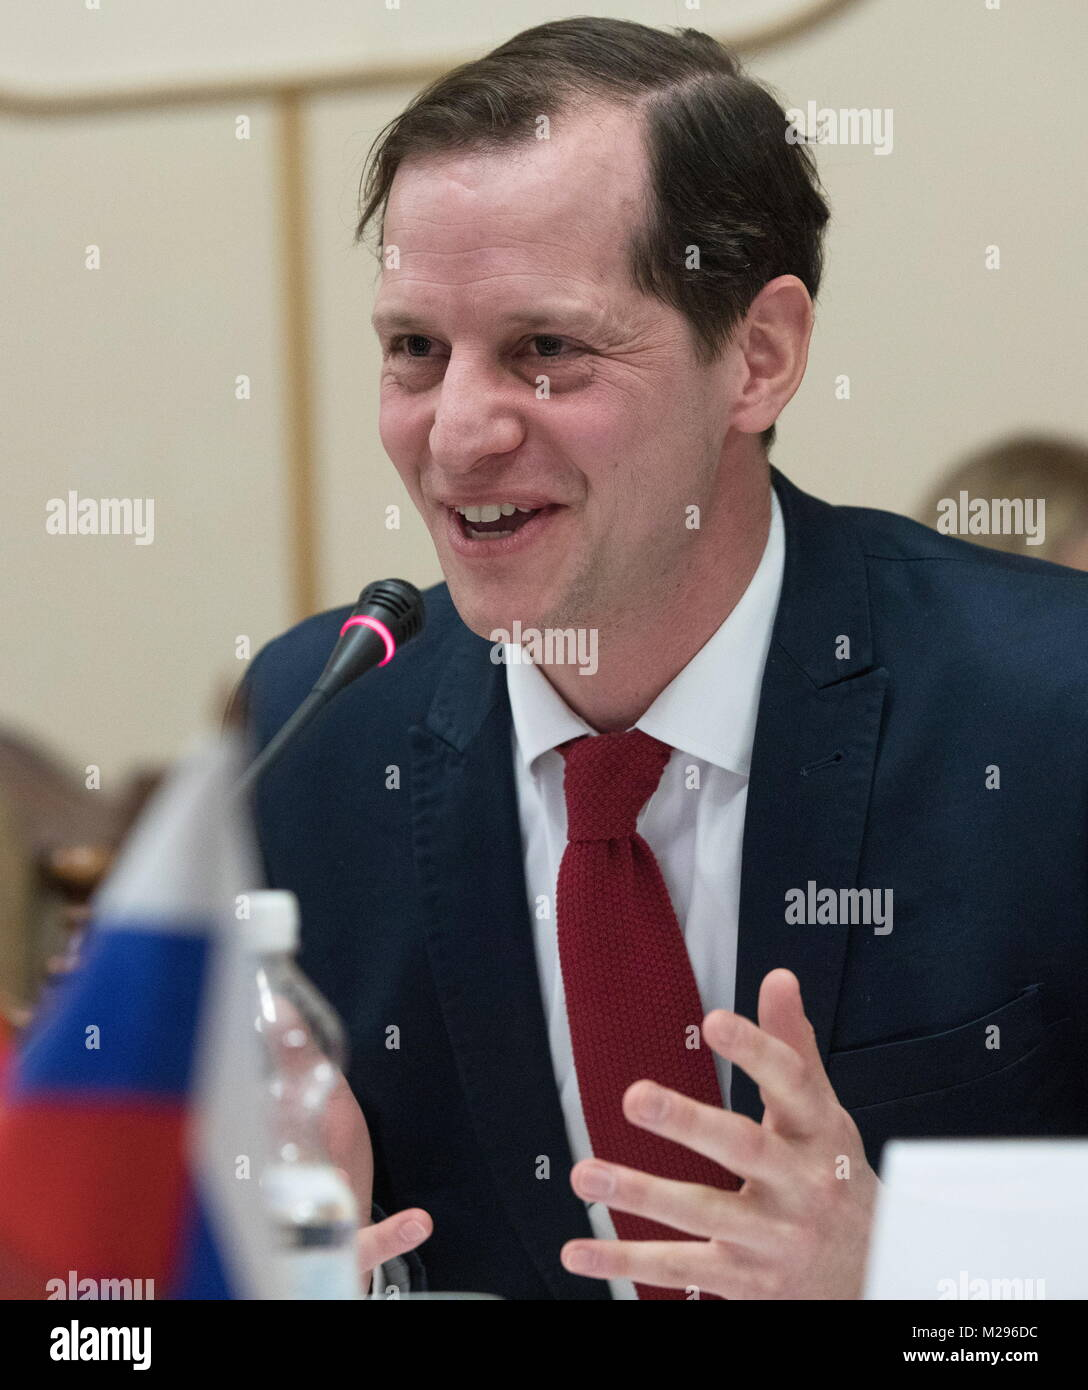 SIMFEROPOL, RUSSIA - FEBRUARY 6, 2018: Roger Beckamp, member of North Rhine-Westphalia's regional parliament - Stock Image